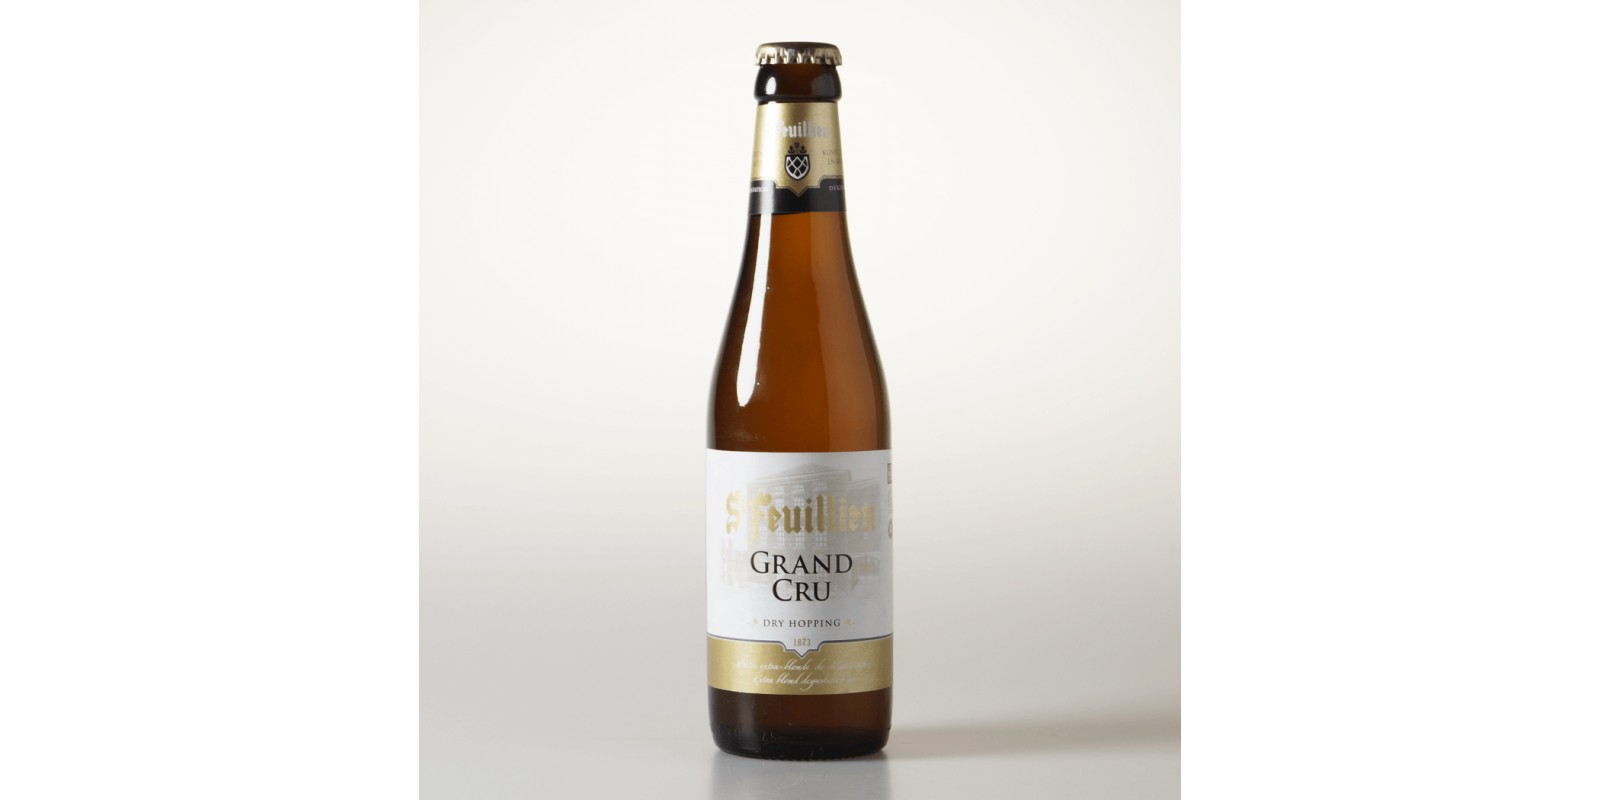 Lekkere-blondbieren-St.-Feullien-Grand-Cru-762x800